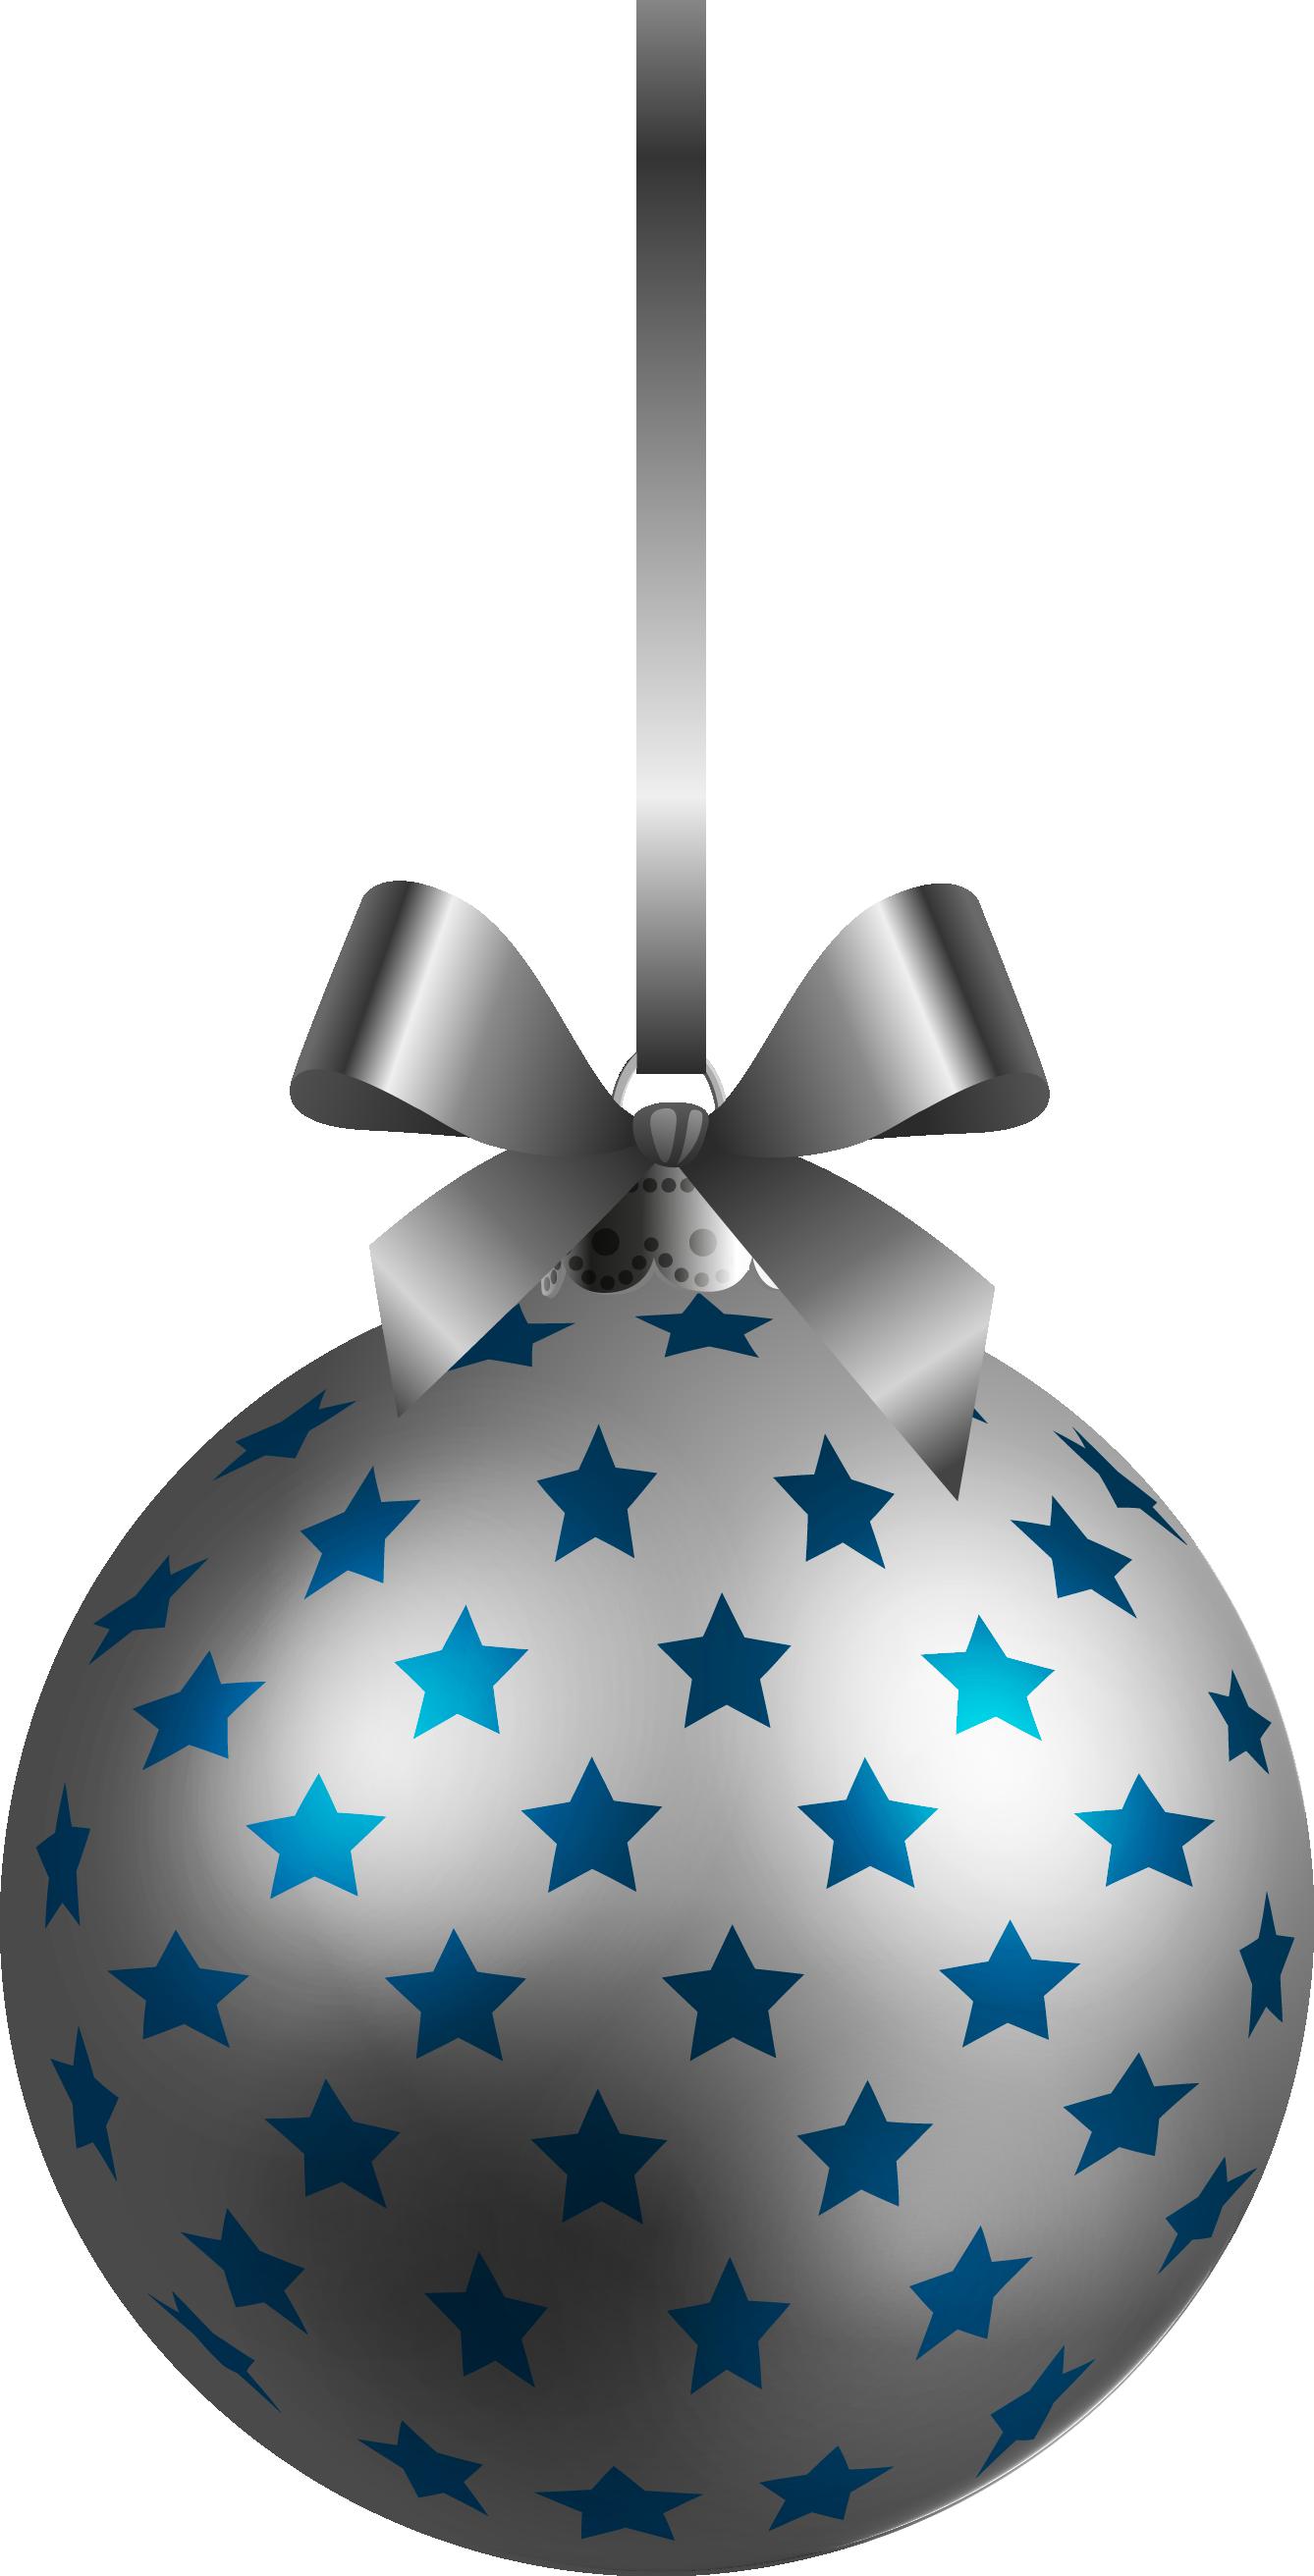 Large Transparent Bluesilver Christmas Ball Ornament Png Clipart Christmas Applique Designs Christmas Applique Christmas Ornaments